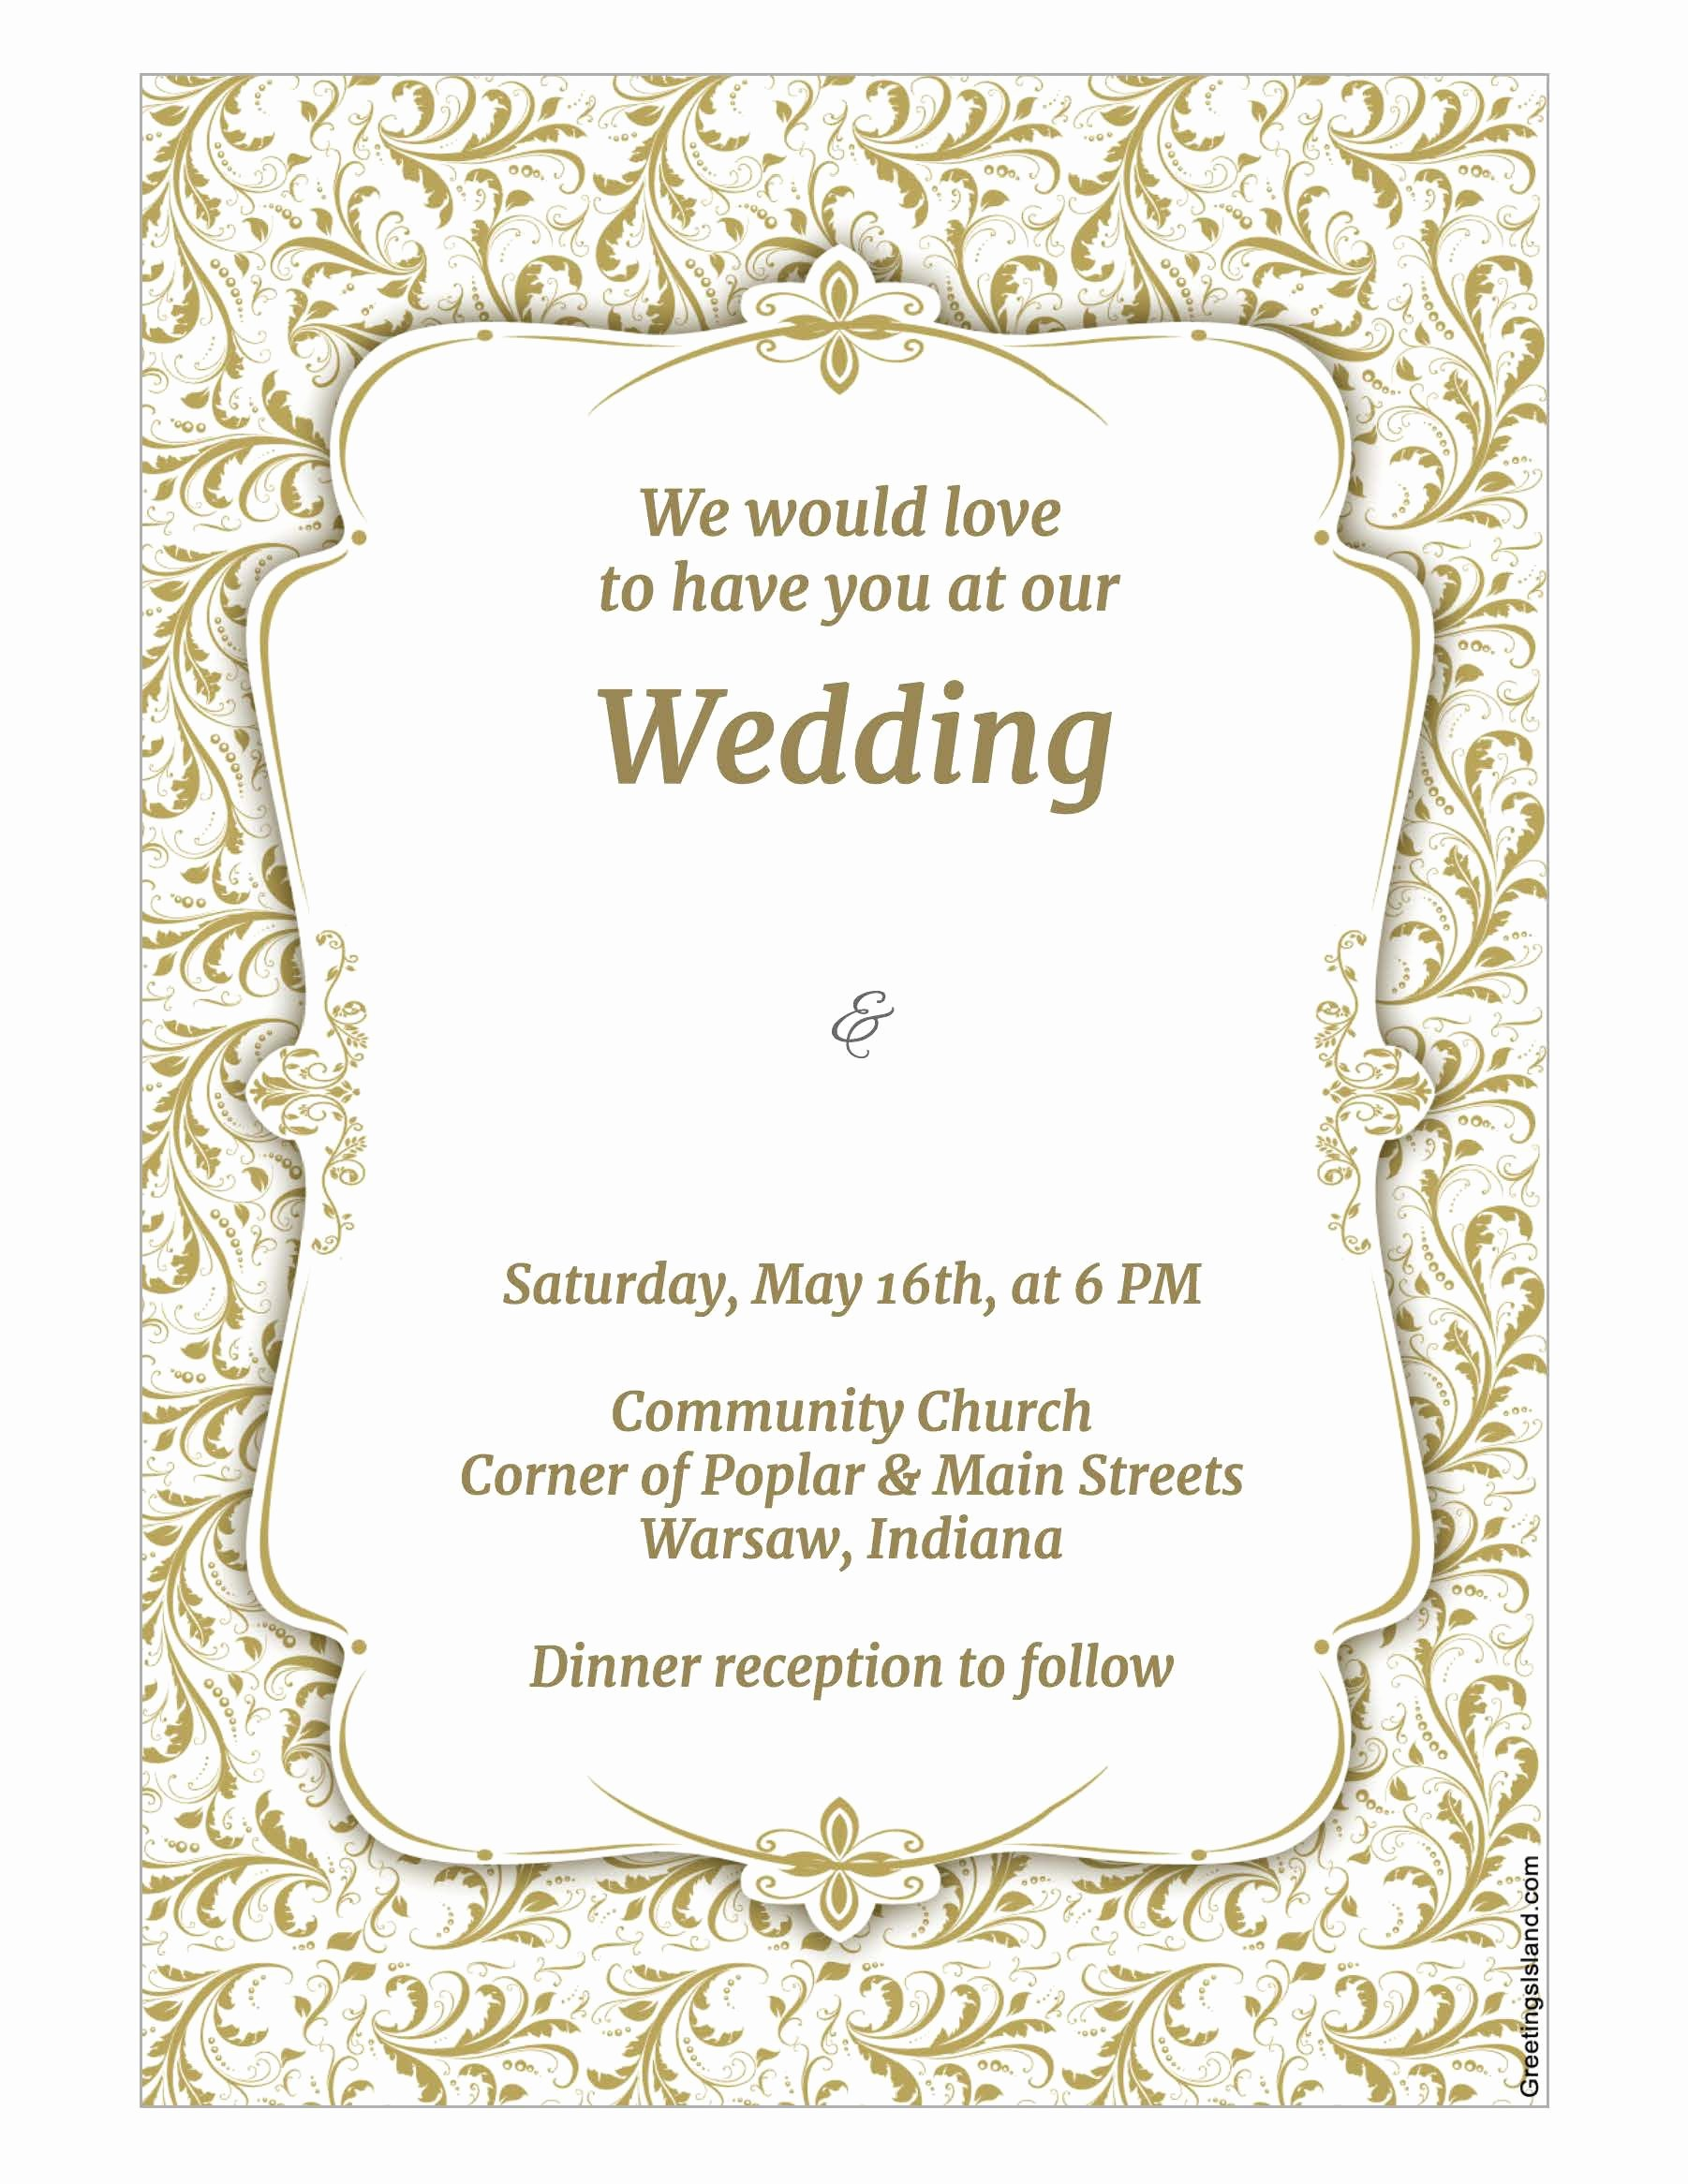 Wedding Invite Photoshop Template Elegant Wedding Invitation Template Wedding Invitation Template